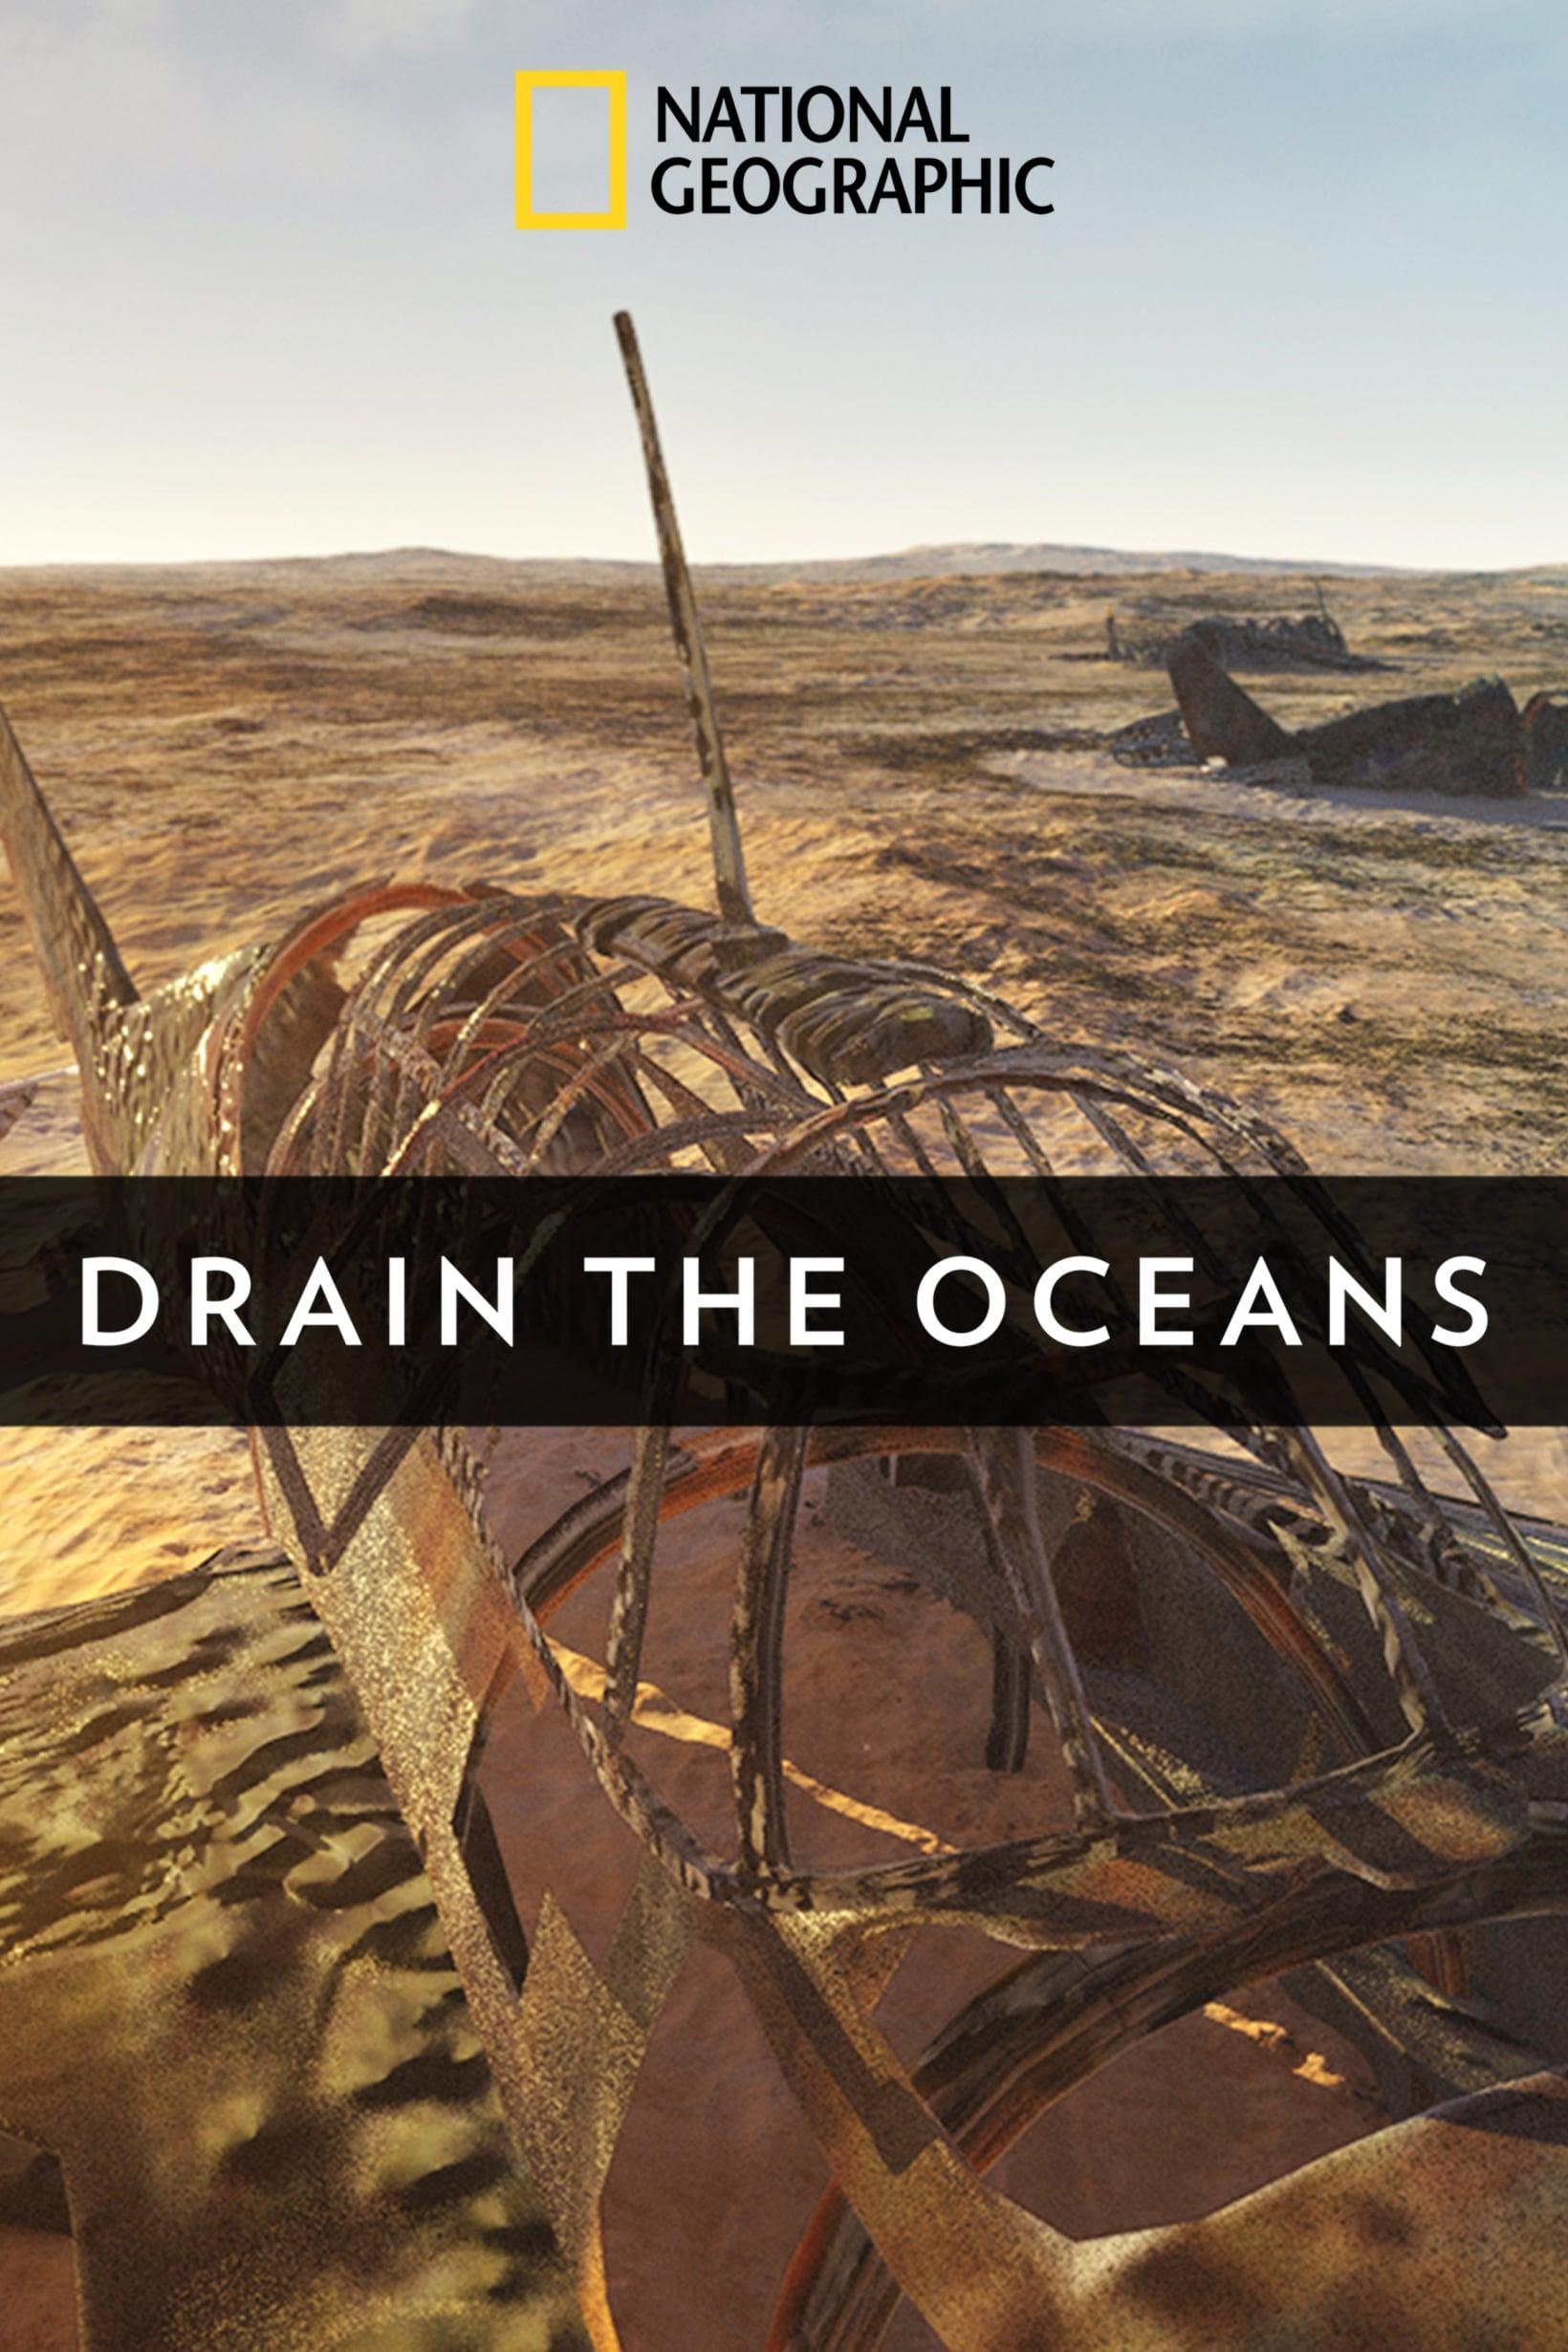 Drain the Oceans (2018)